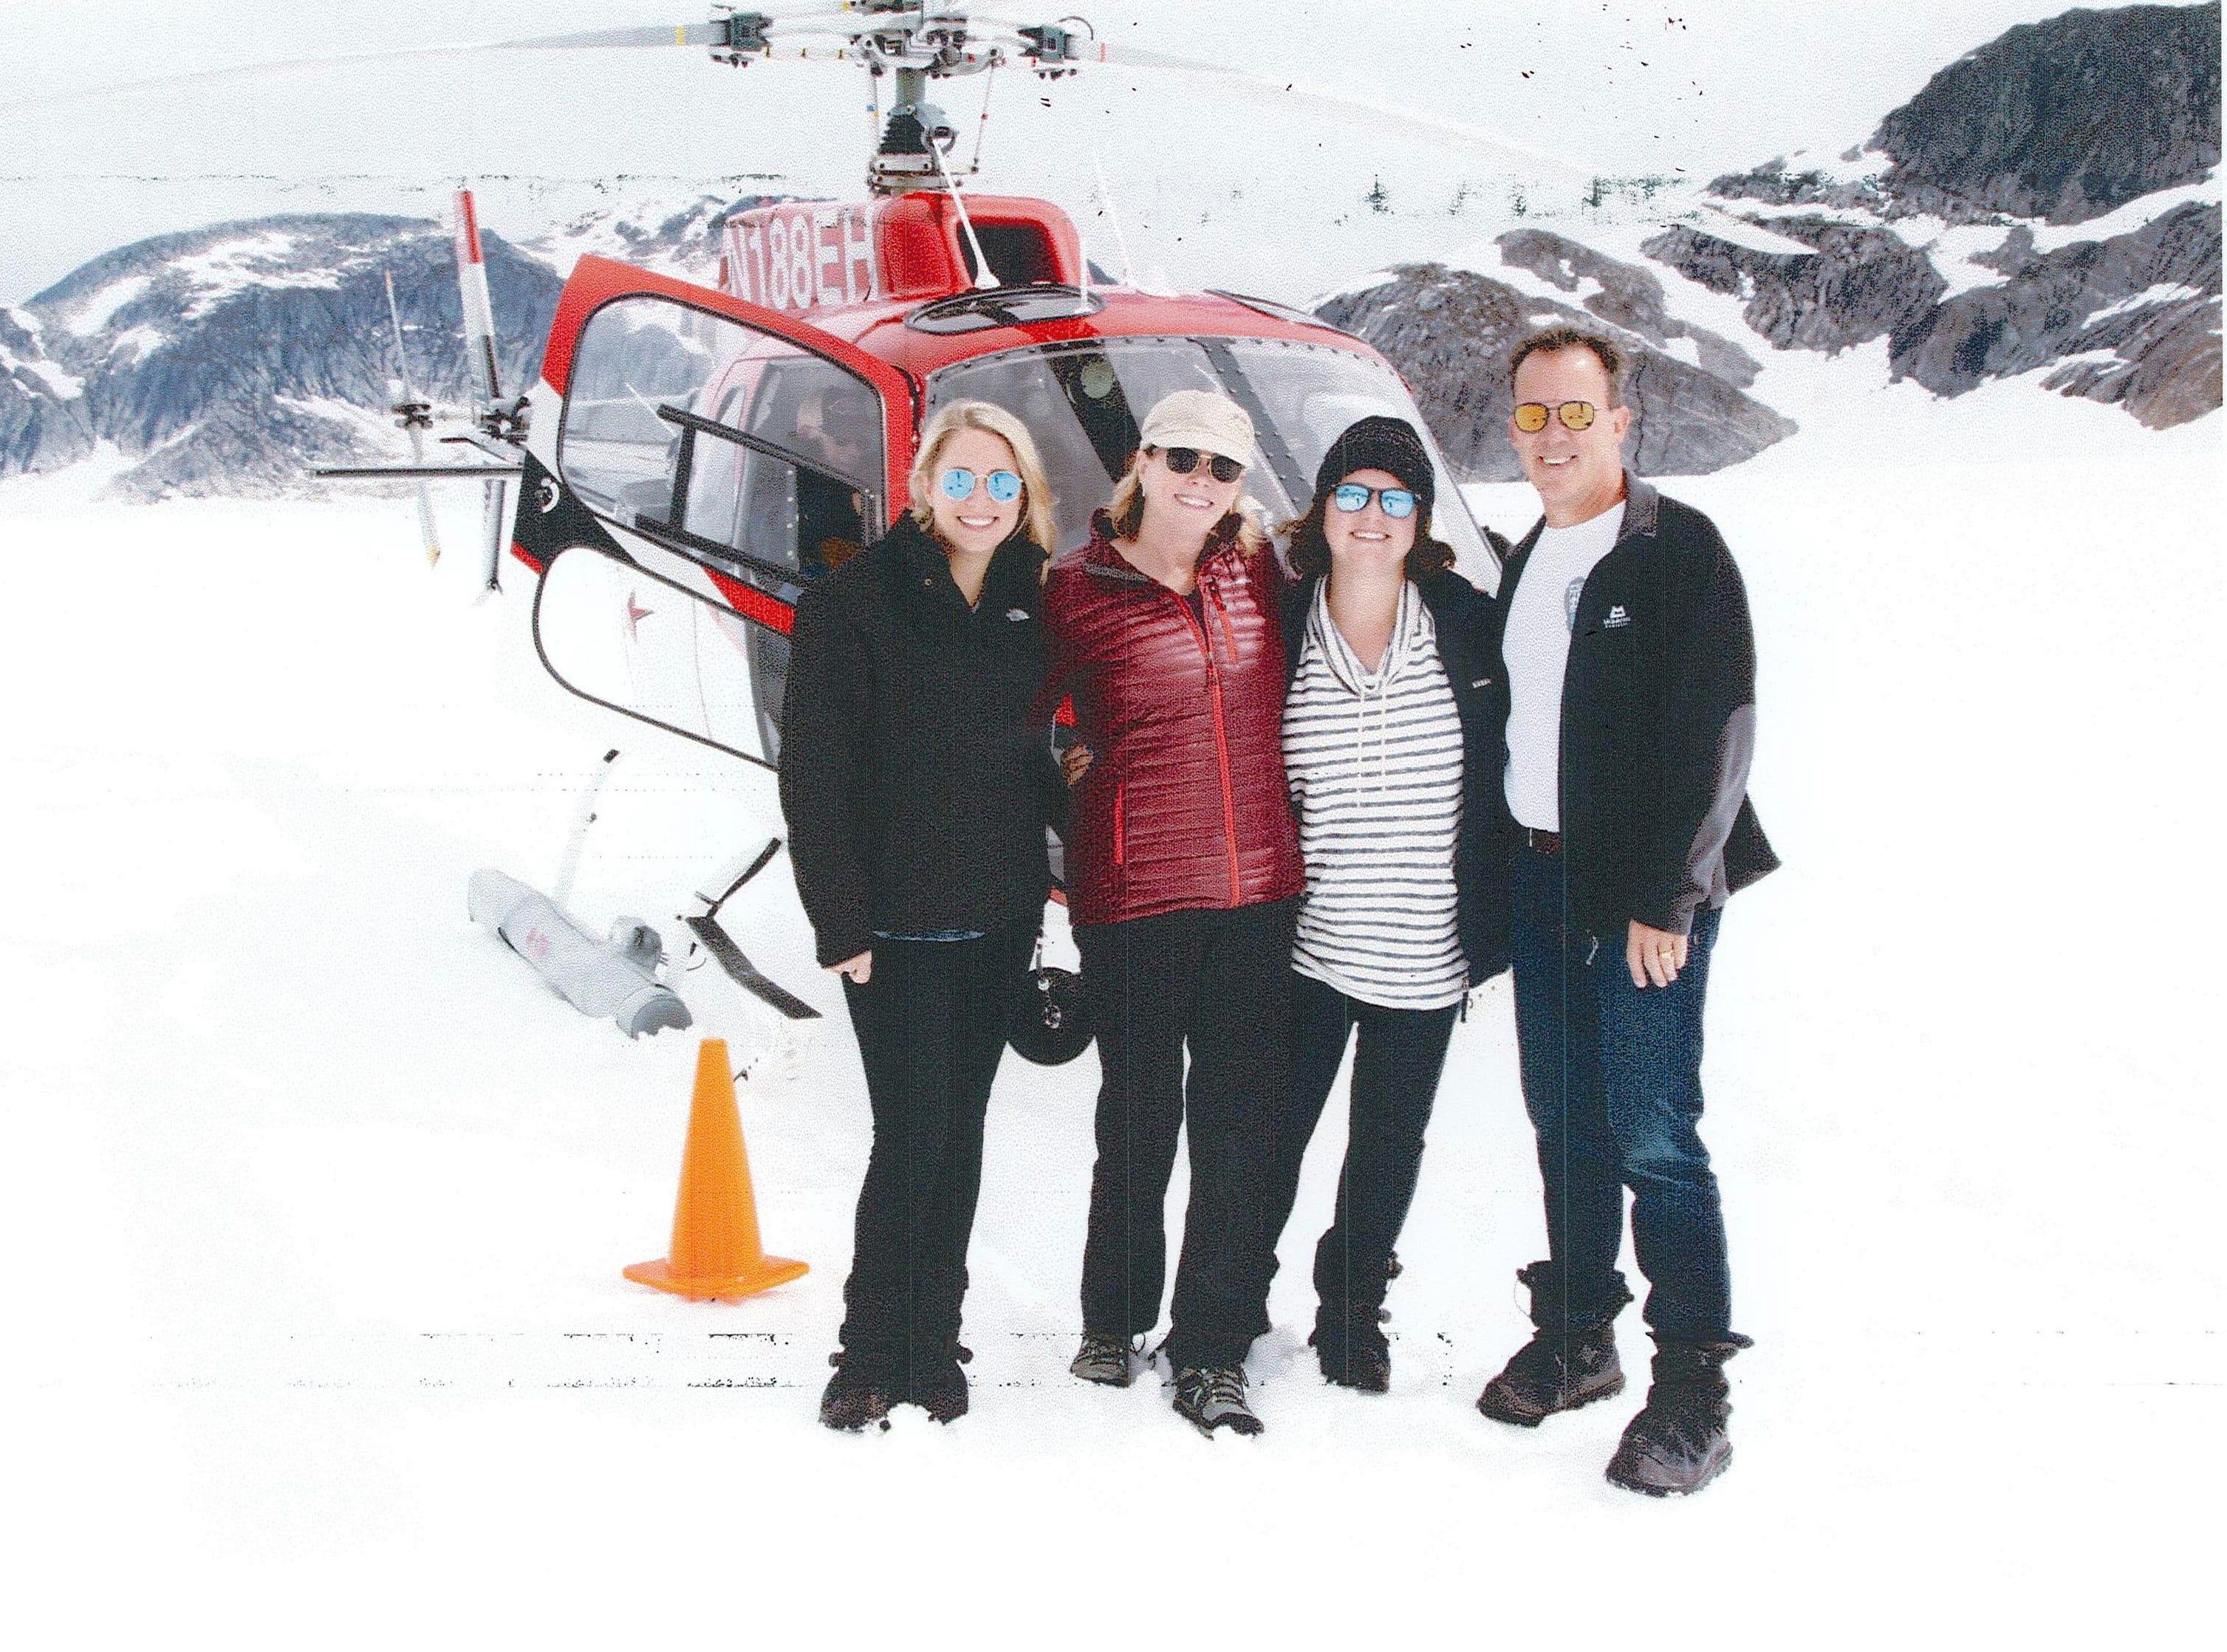 Tom Prater's family